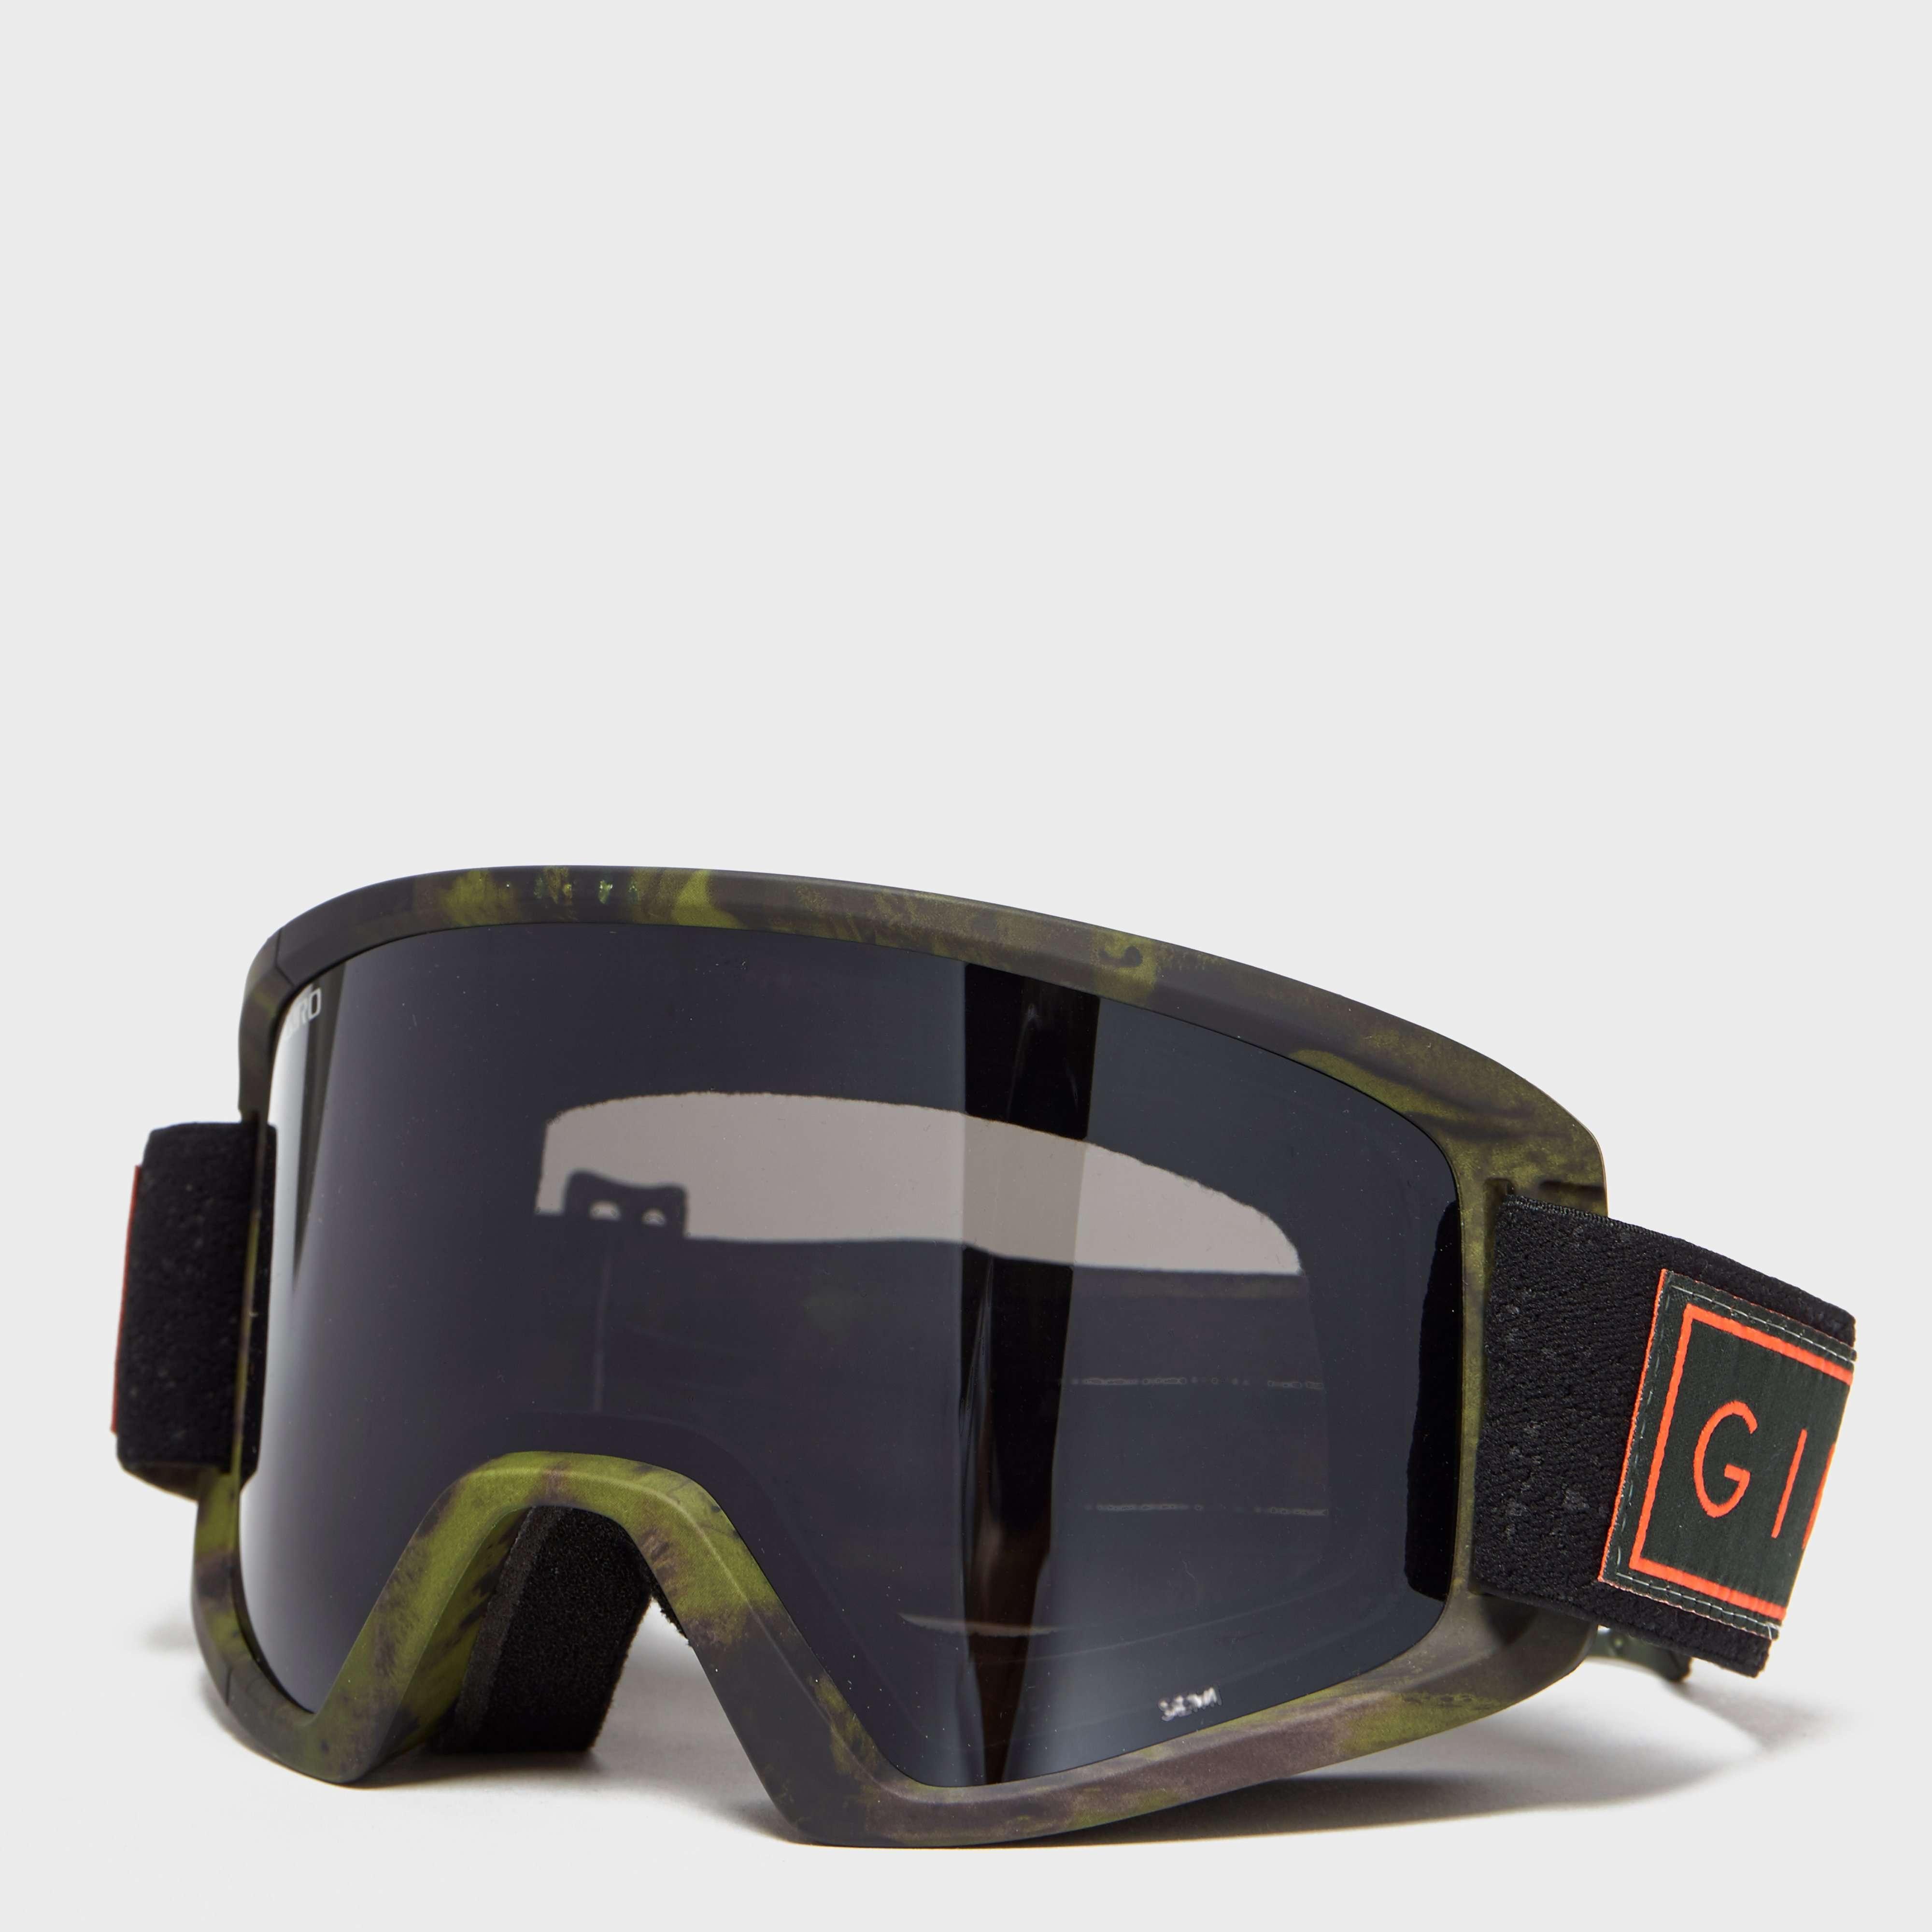 GIRO Men's Semi™ Goggle